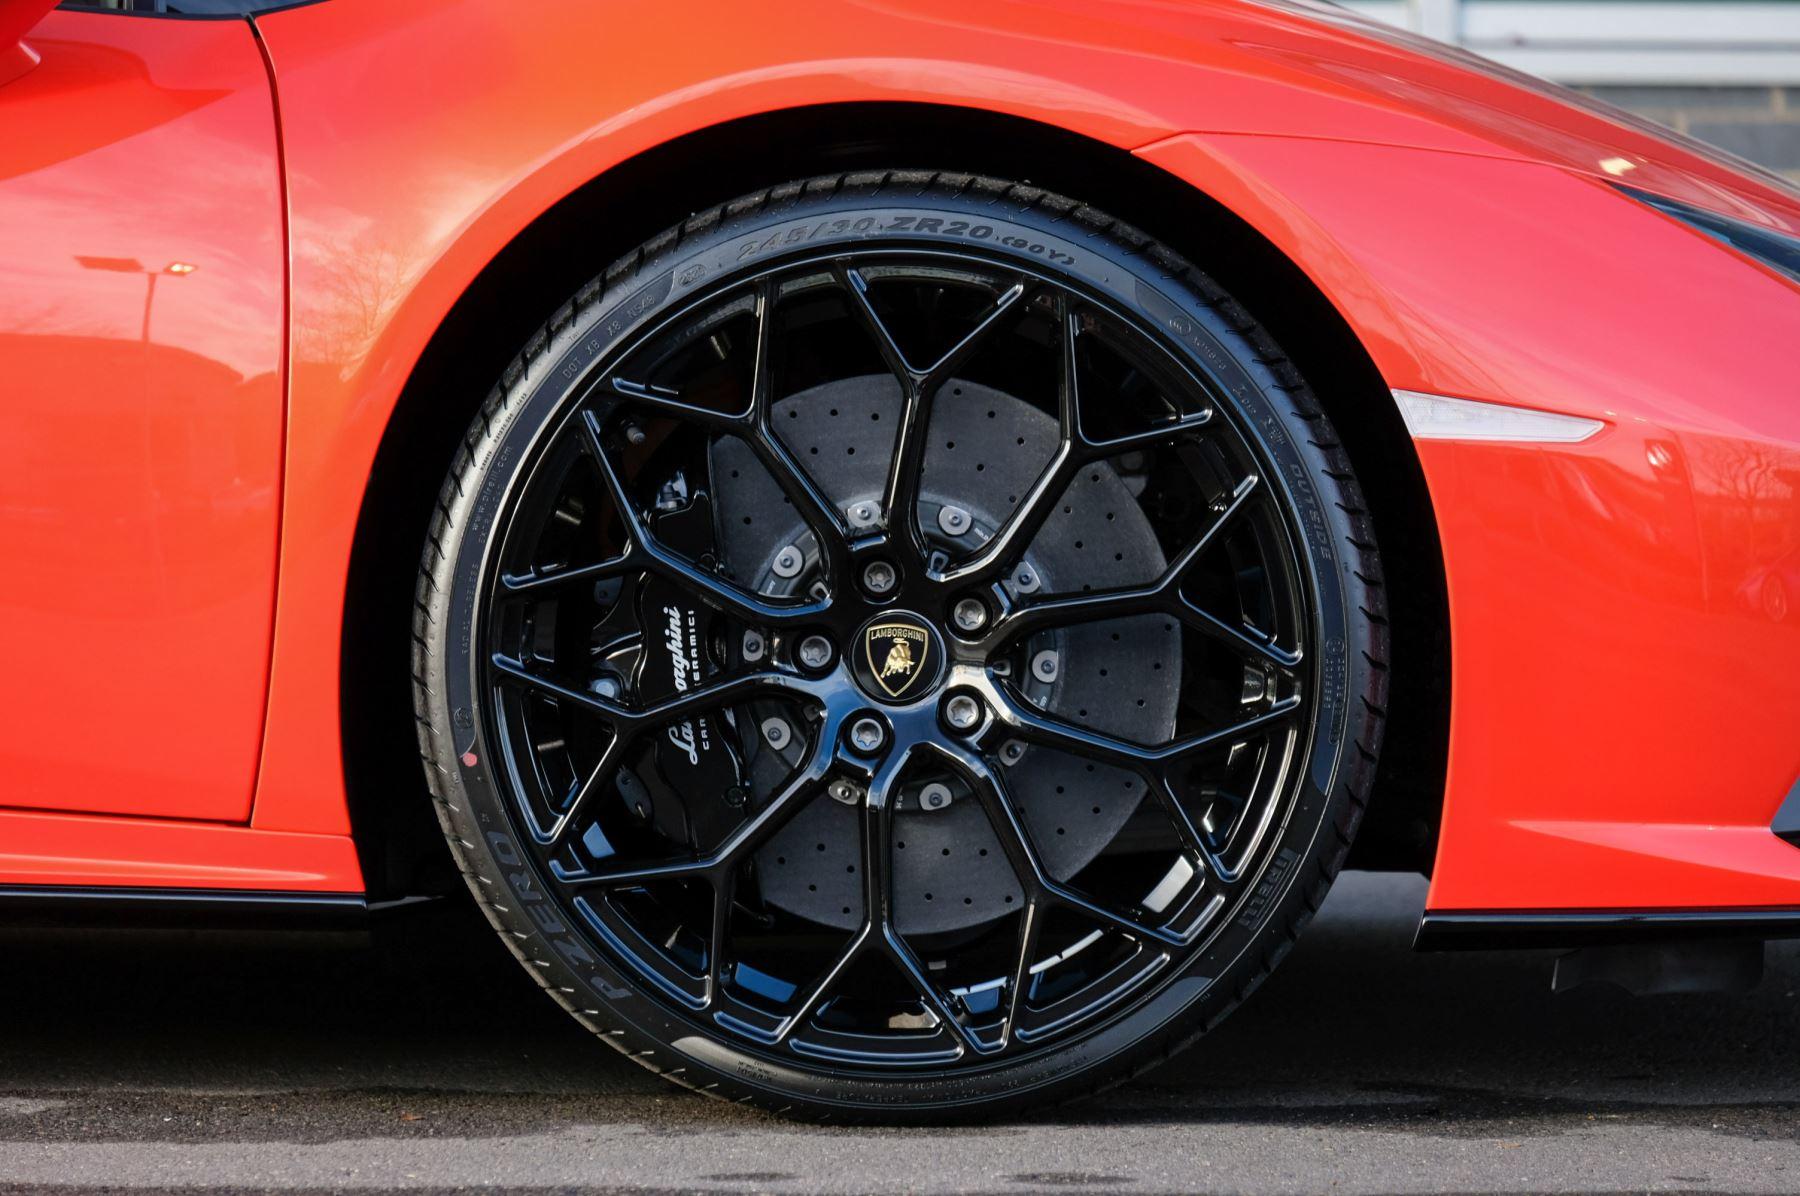 Lamborghini Huracan EVO 5.2 V10 640 2dr Auto AWD image 9